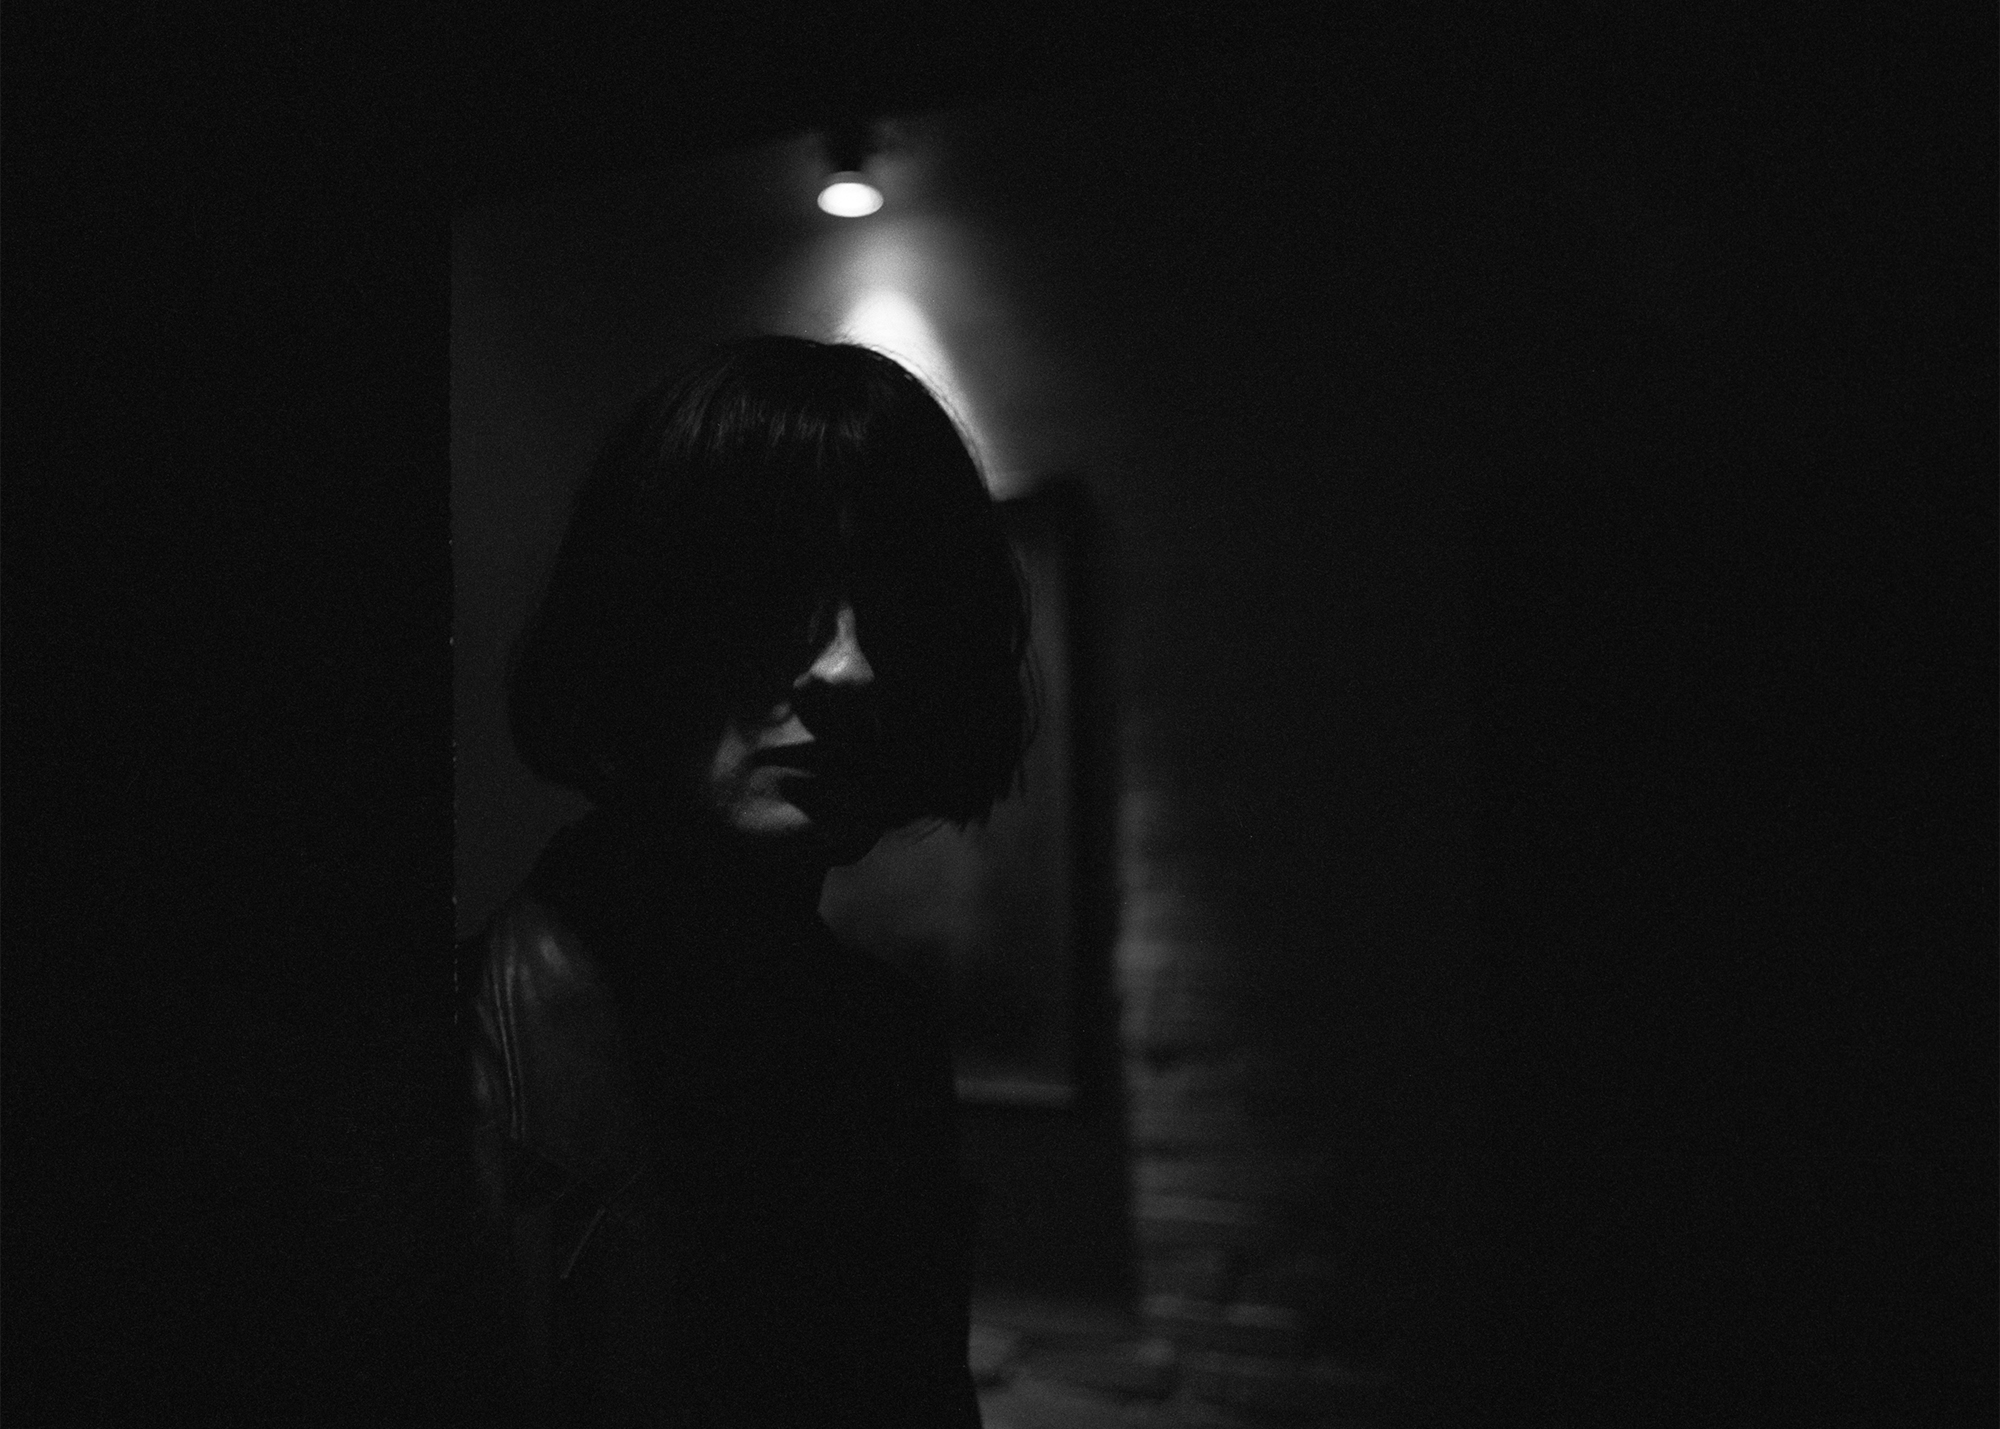 14_shadows.jpg